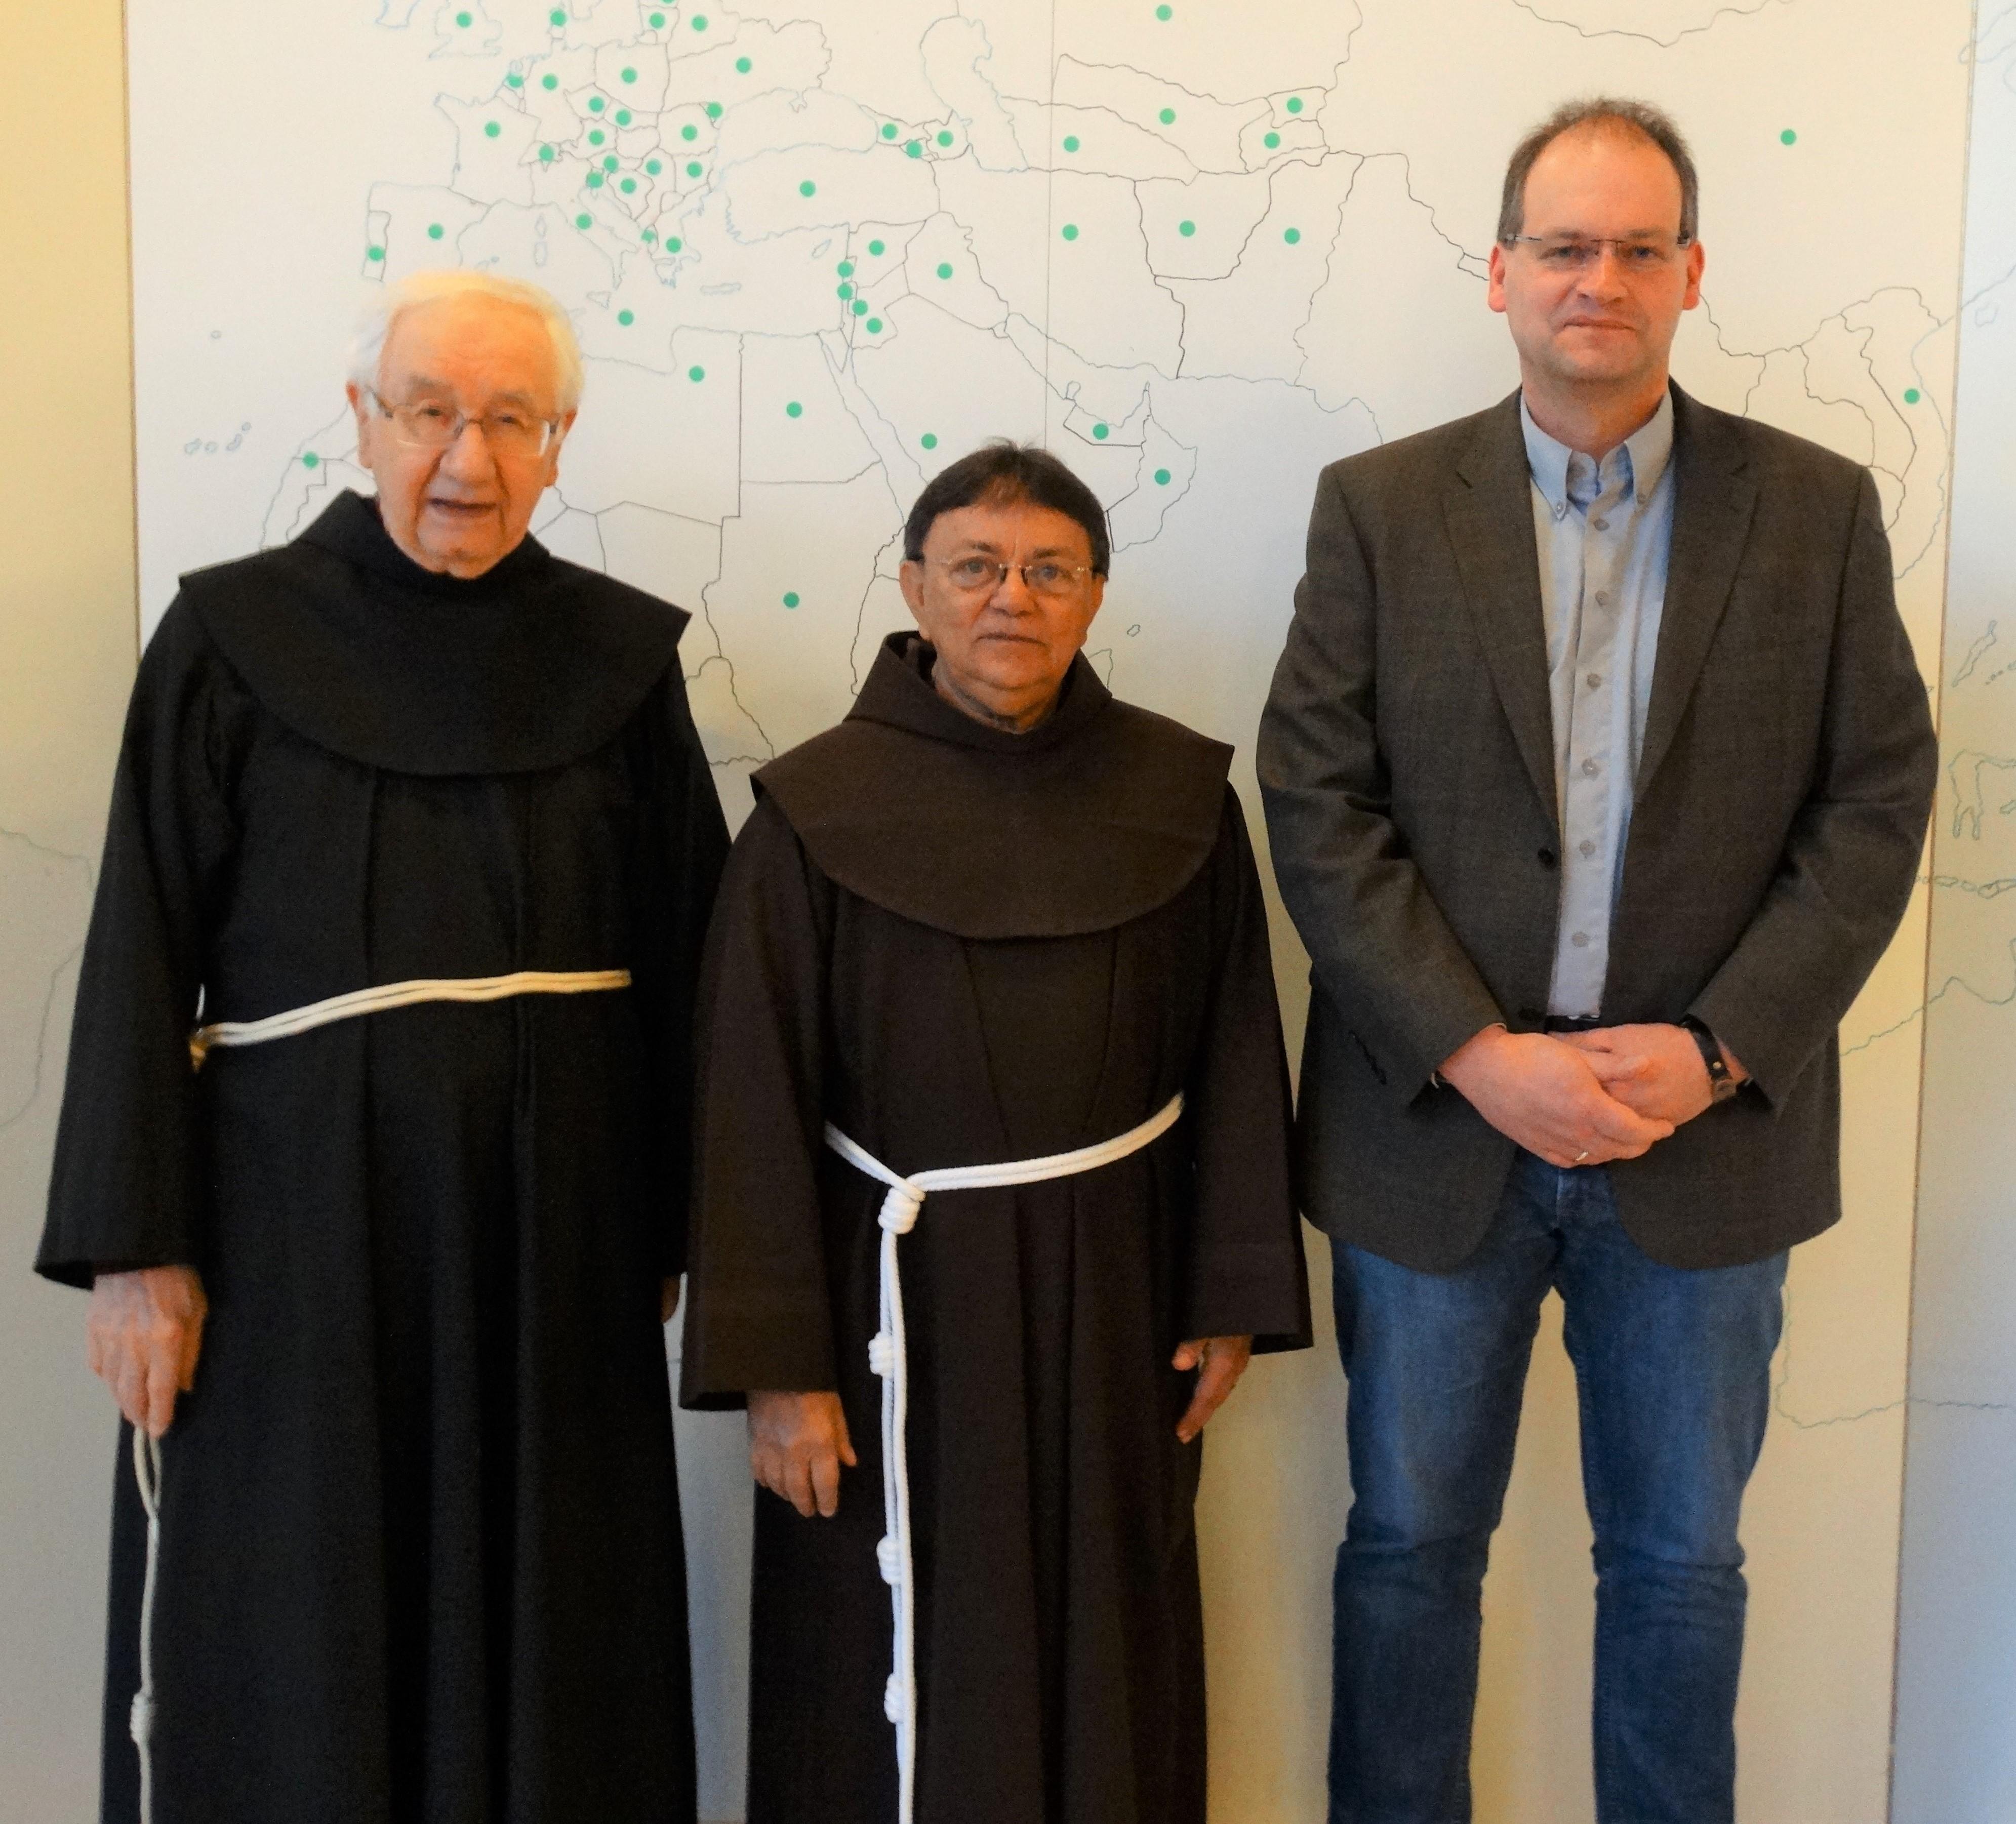 Pater Osmar, Pater Amilton, Thorsten Bahlmann